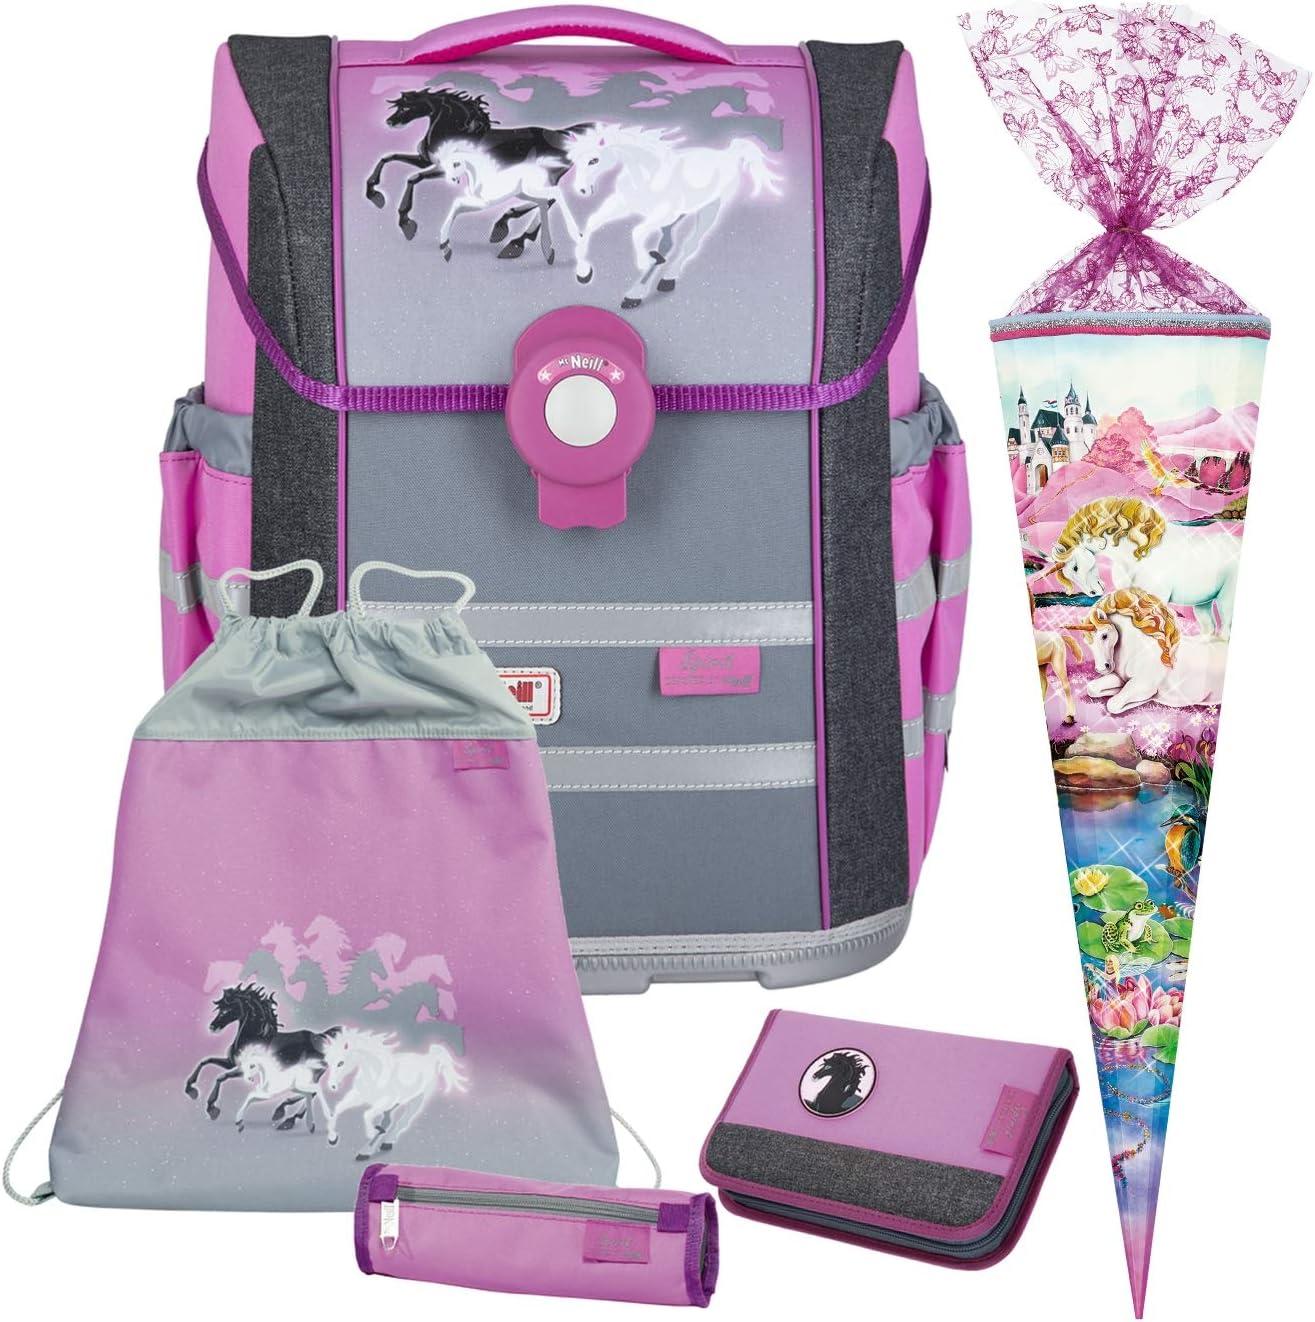 Spirit McNeill Ergo MAC School Bag Set 5 Pieces School Bag